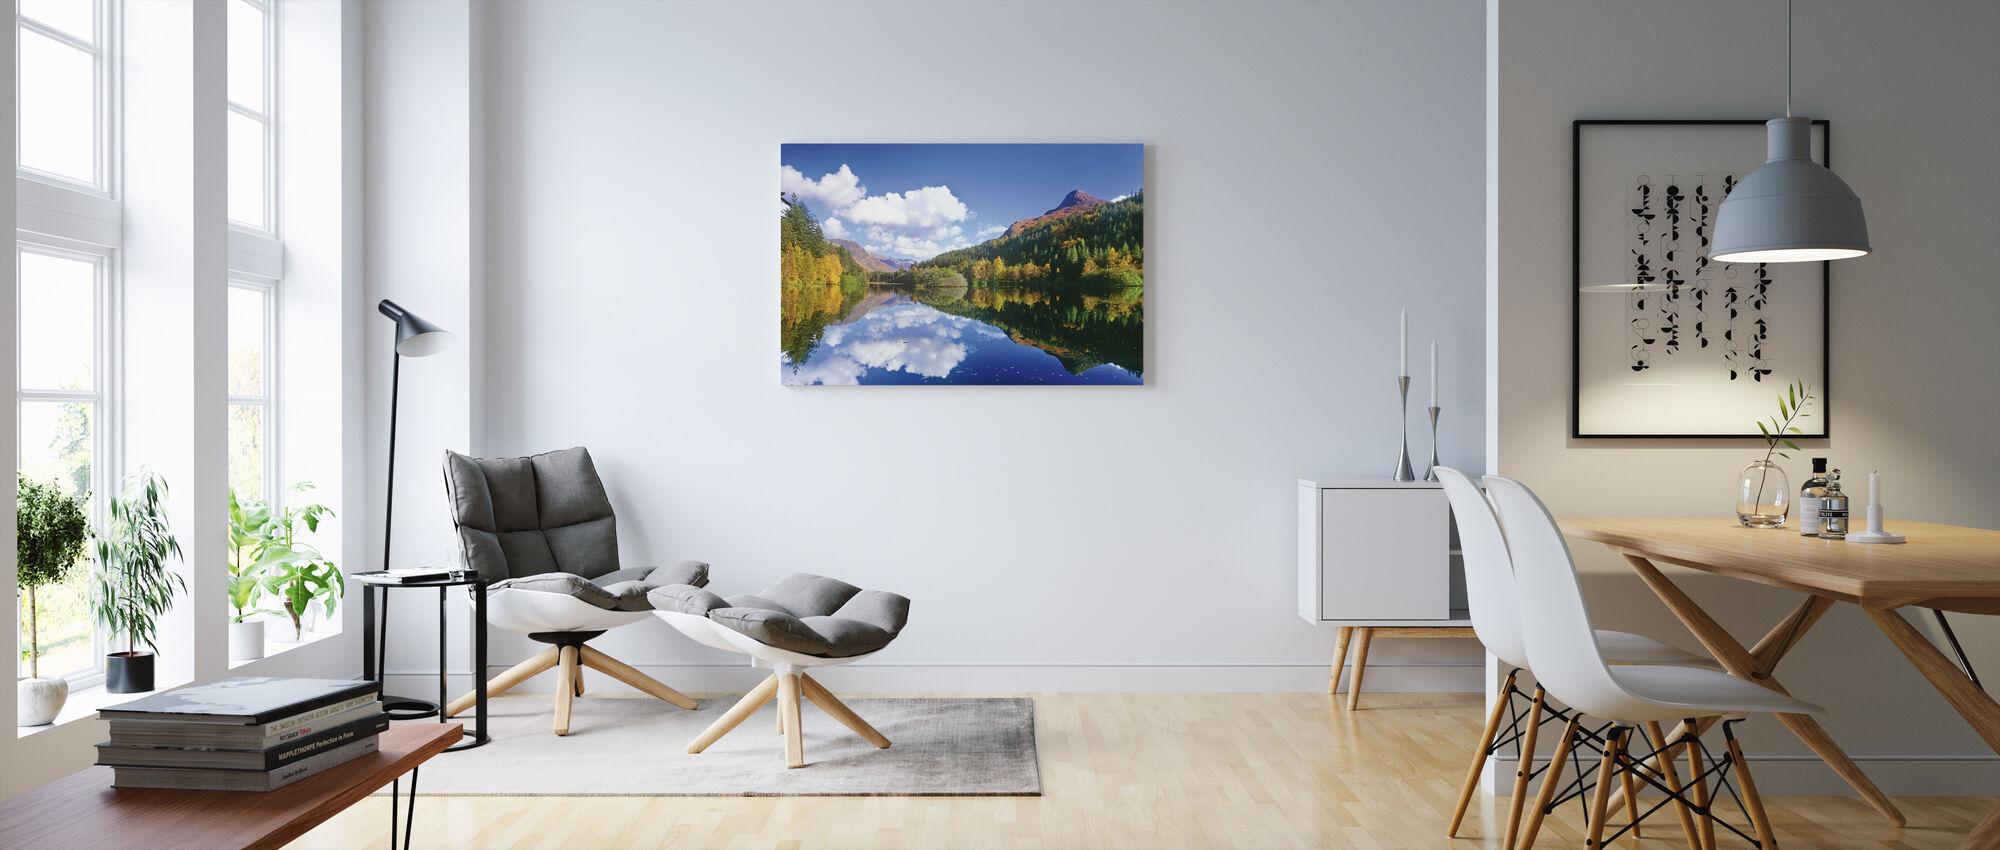 Glencoe Lochan, Skottland - Canvastavla - Vardagsrum